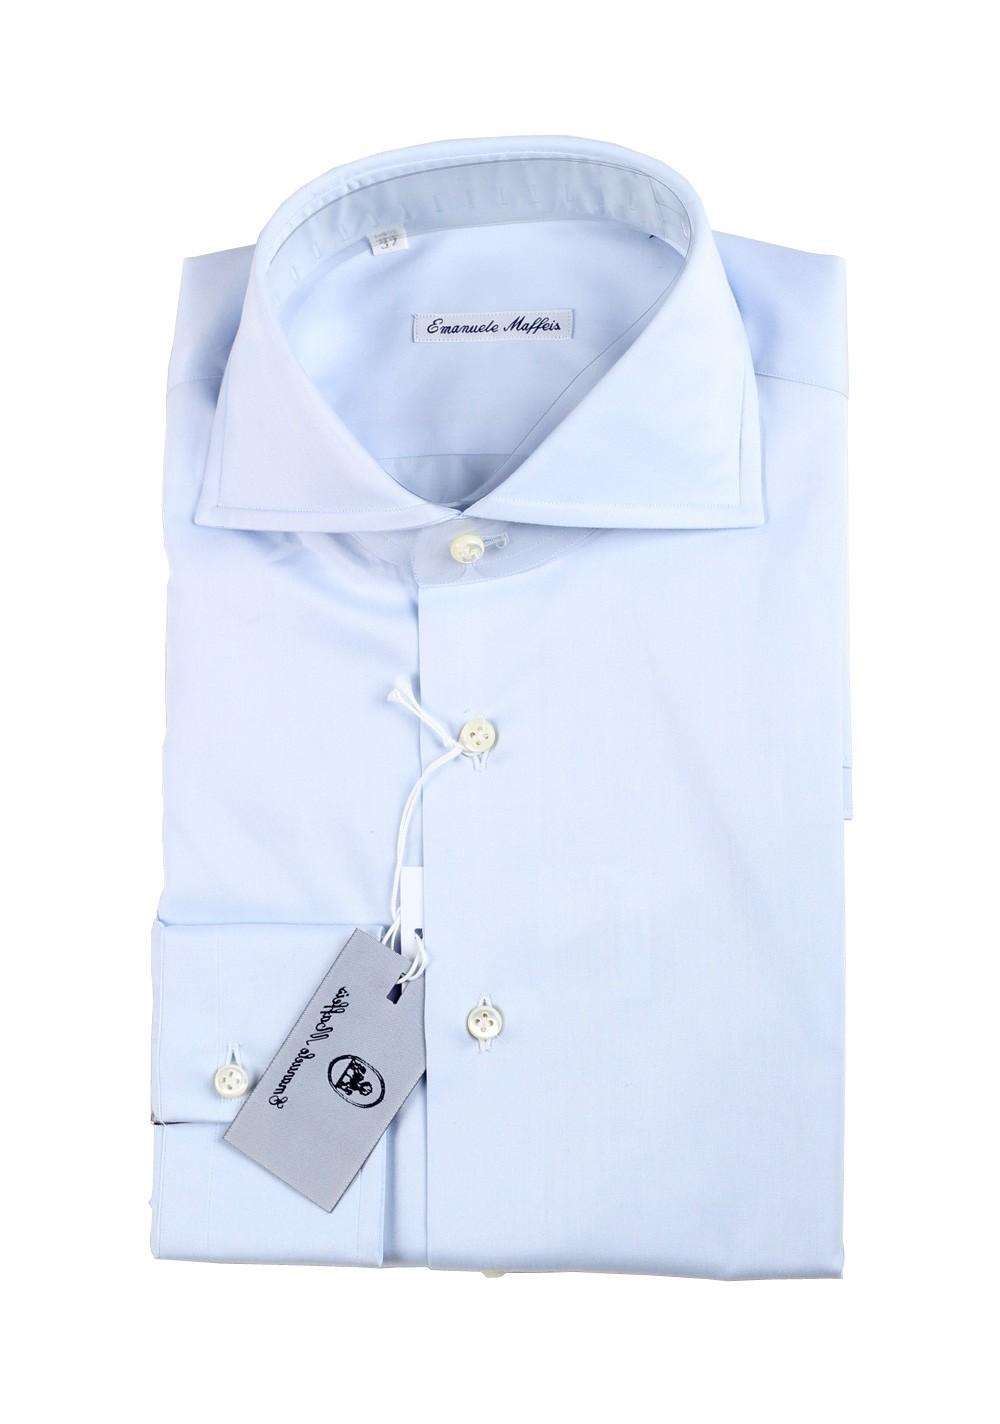 Maffeis 100% Cotton Shirt Size 37 / 14,5  U.S.   Costume Limité